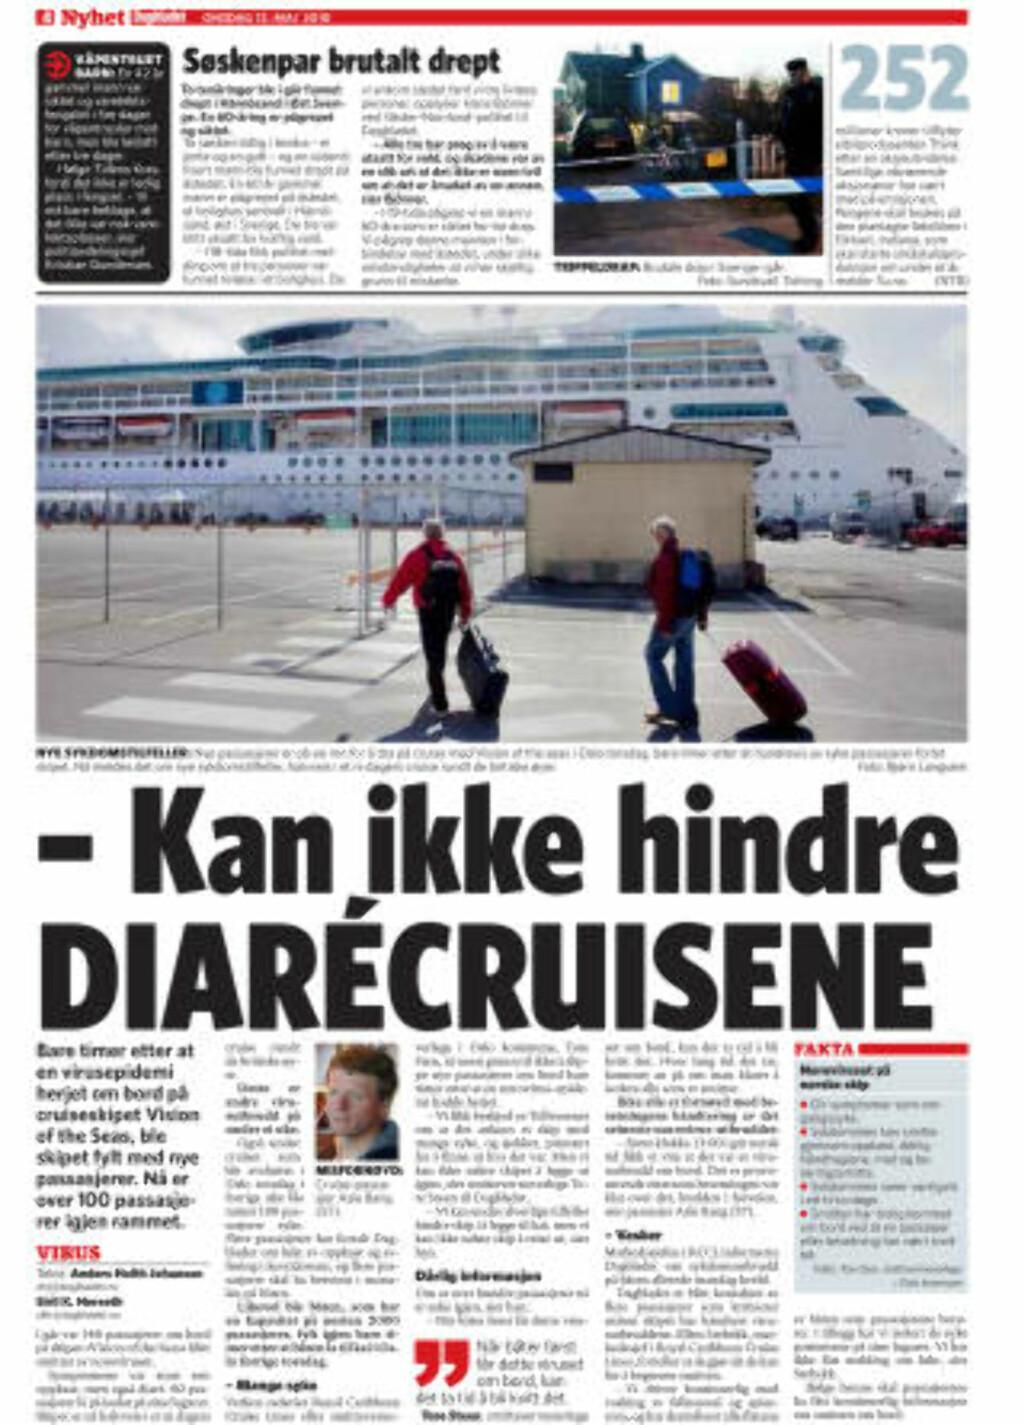 Faksimile: Dagbladet, 12.05.10